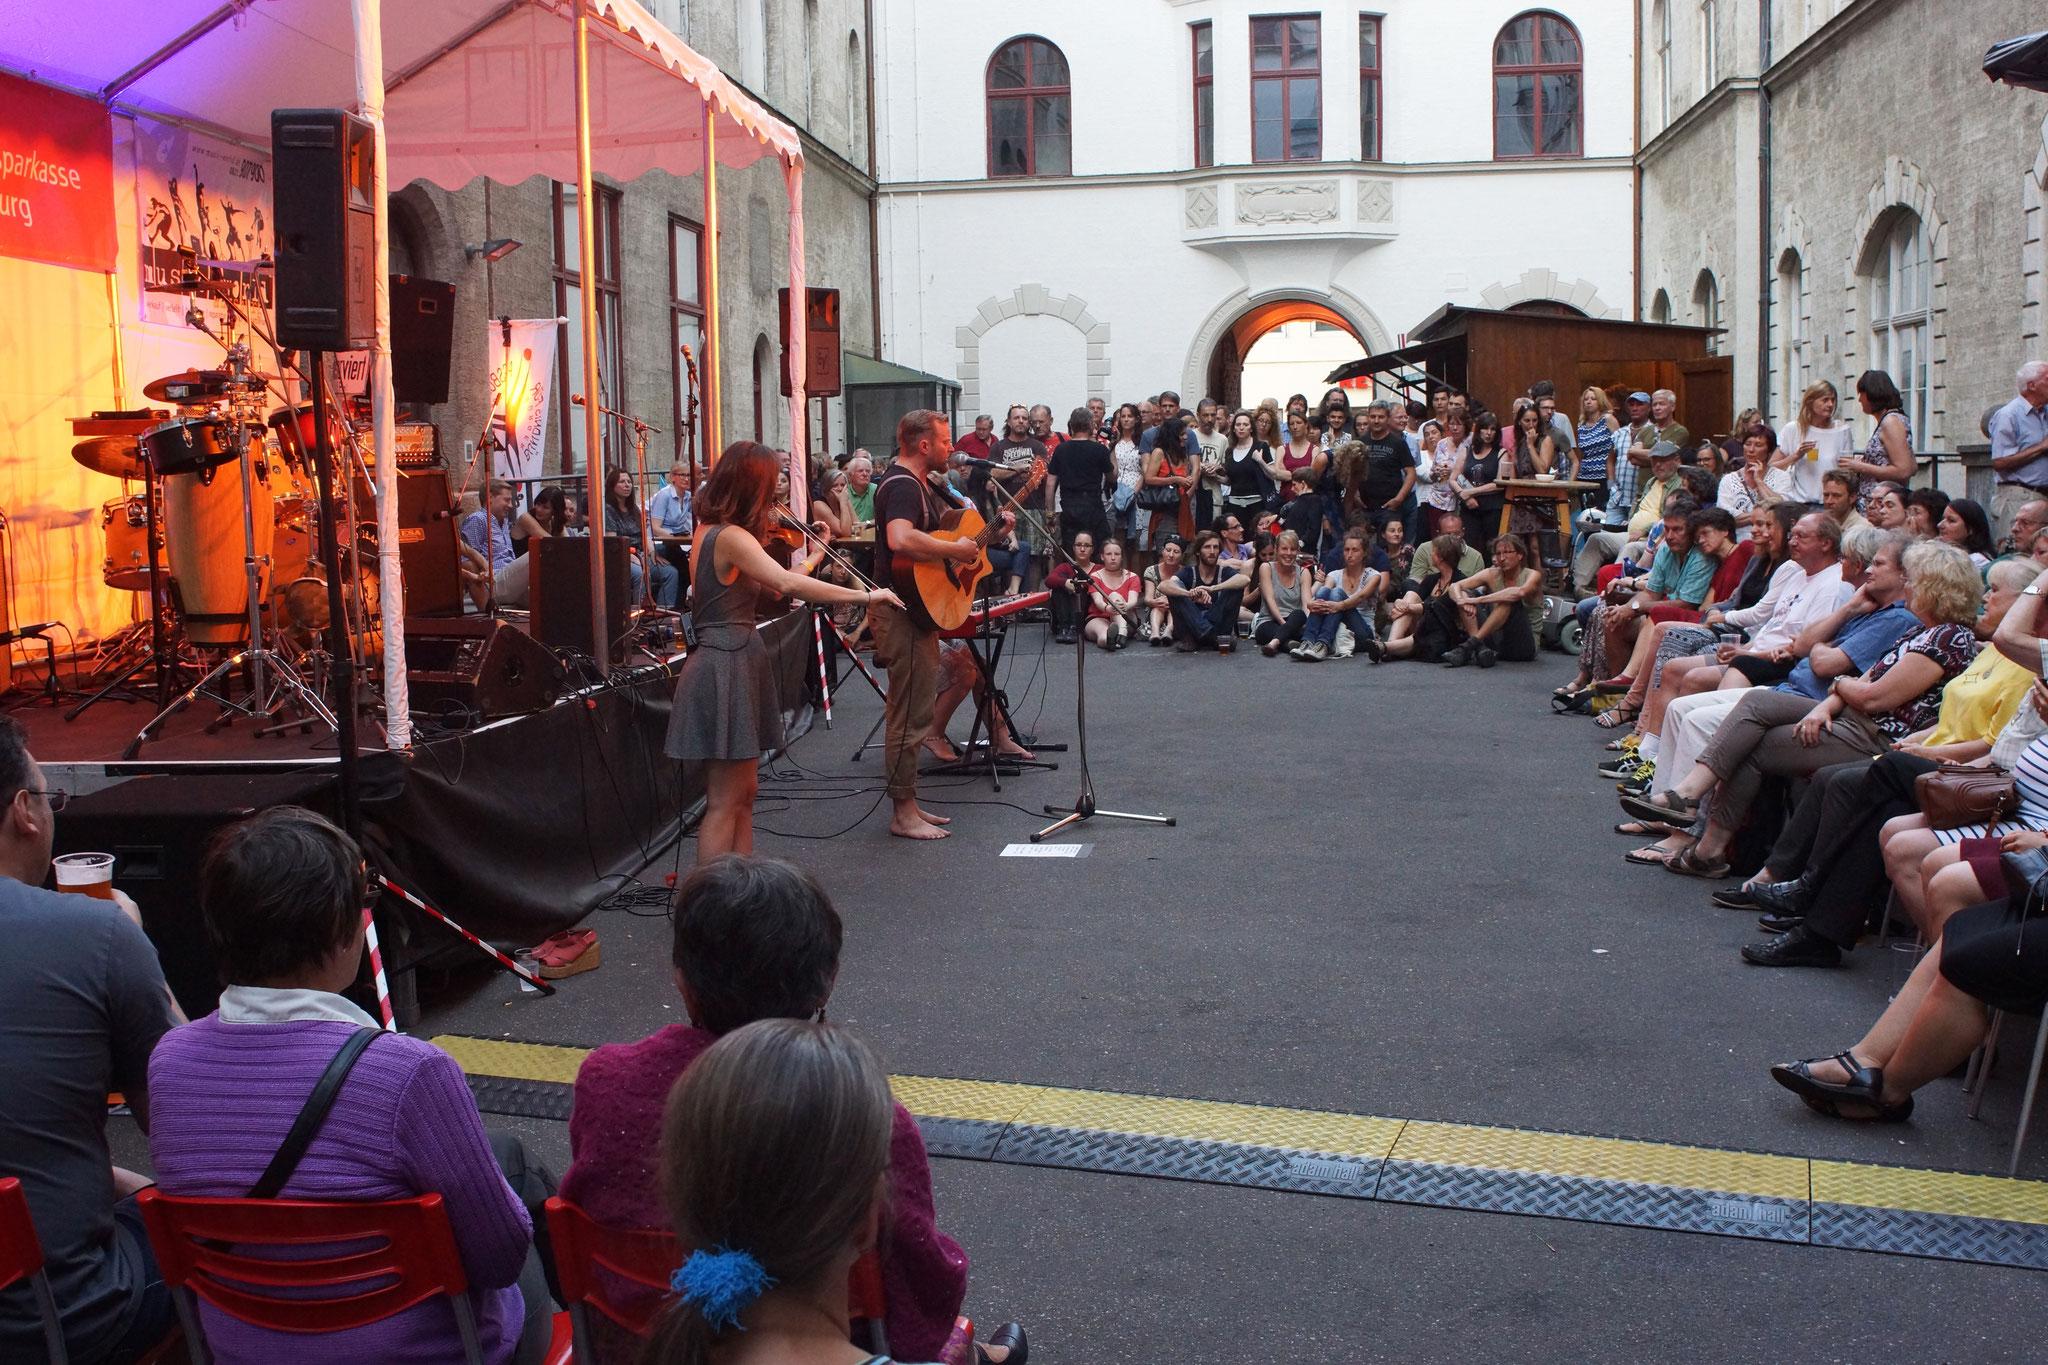 "Konzerte im Bürgerhof 09.07.16 ""a little bit of all"" - Freiwilligen-Zentrum Augsburg - Foto: Crayfish"